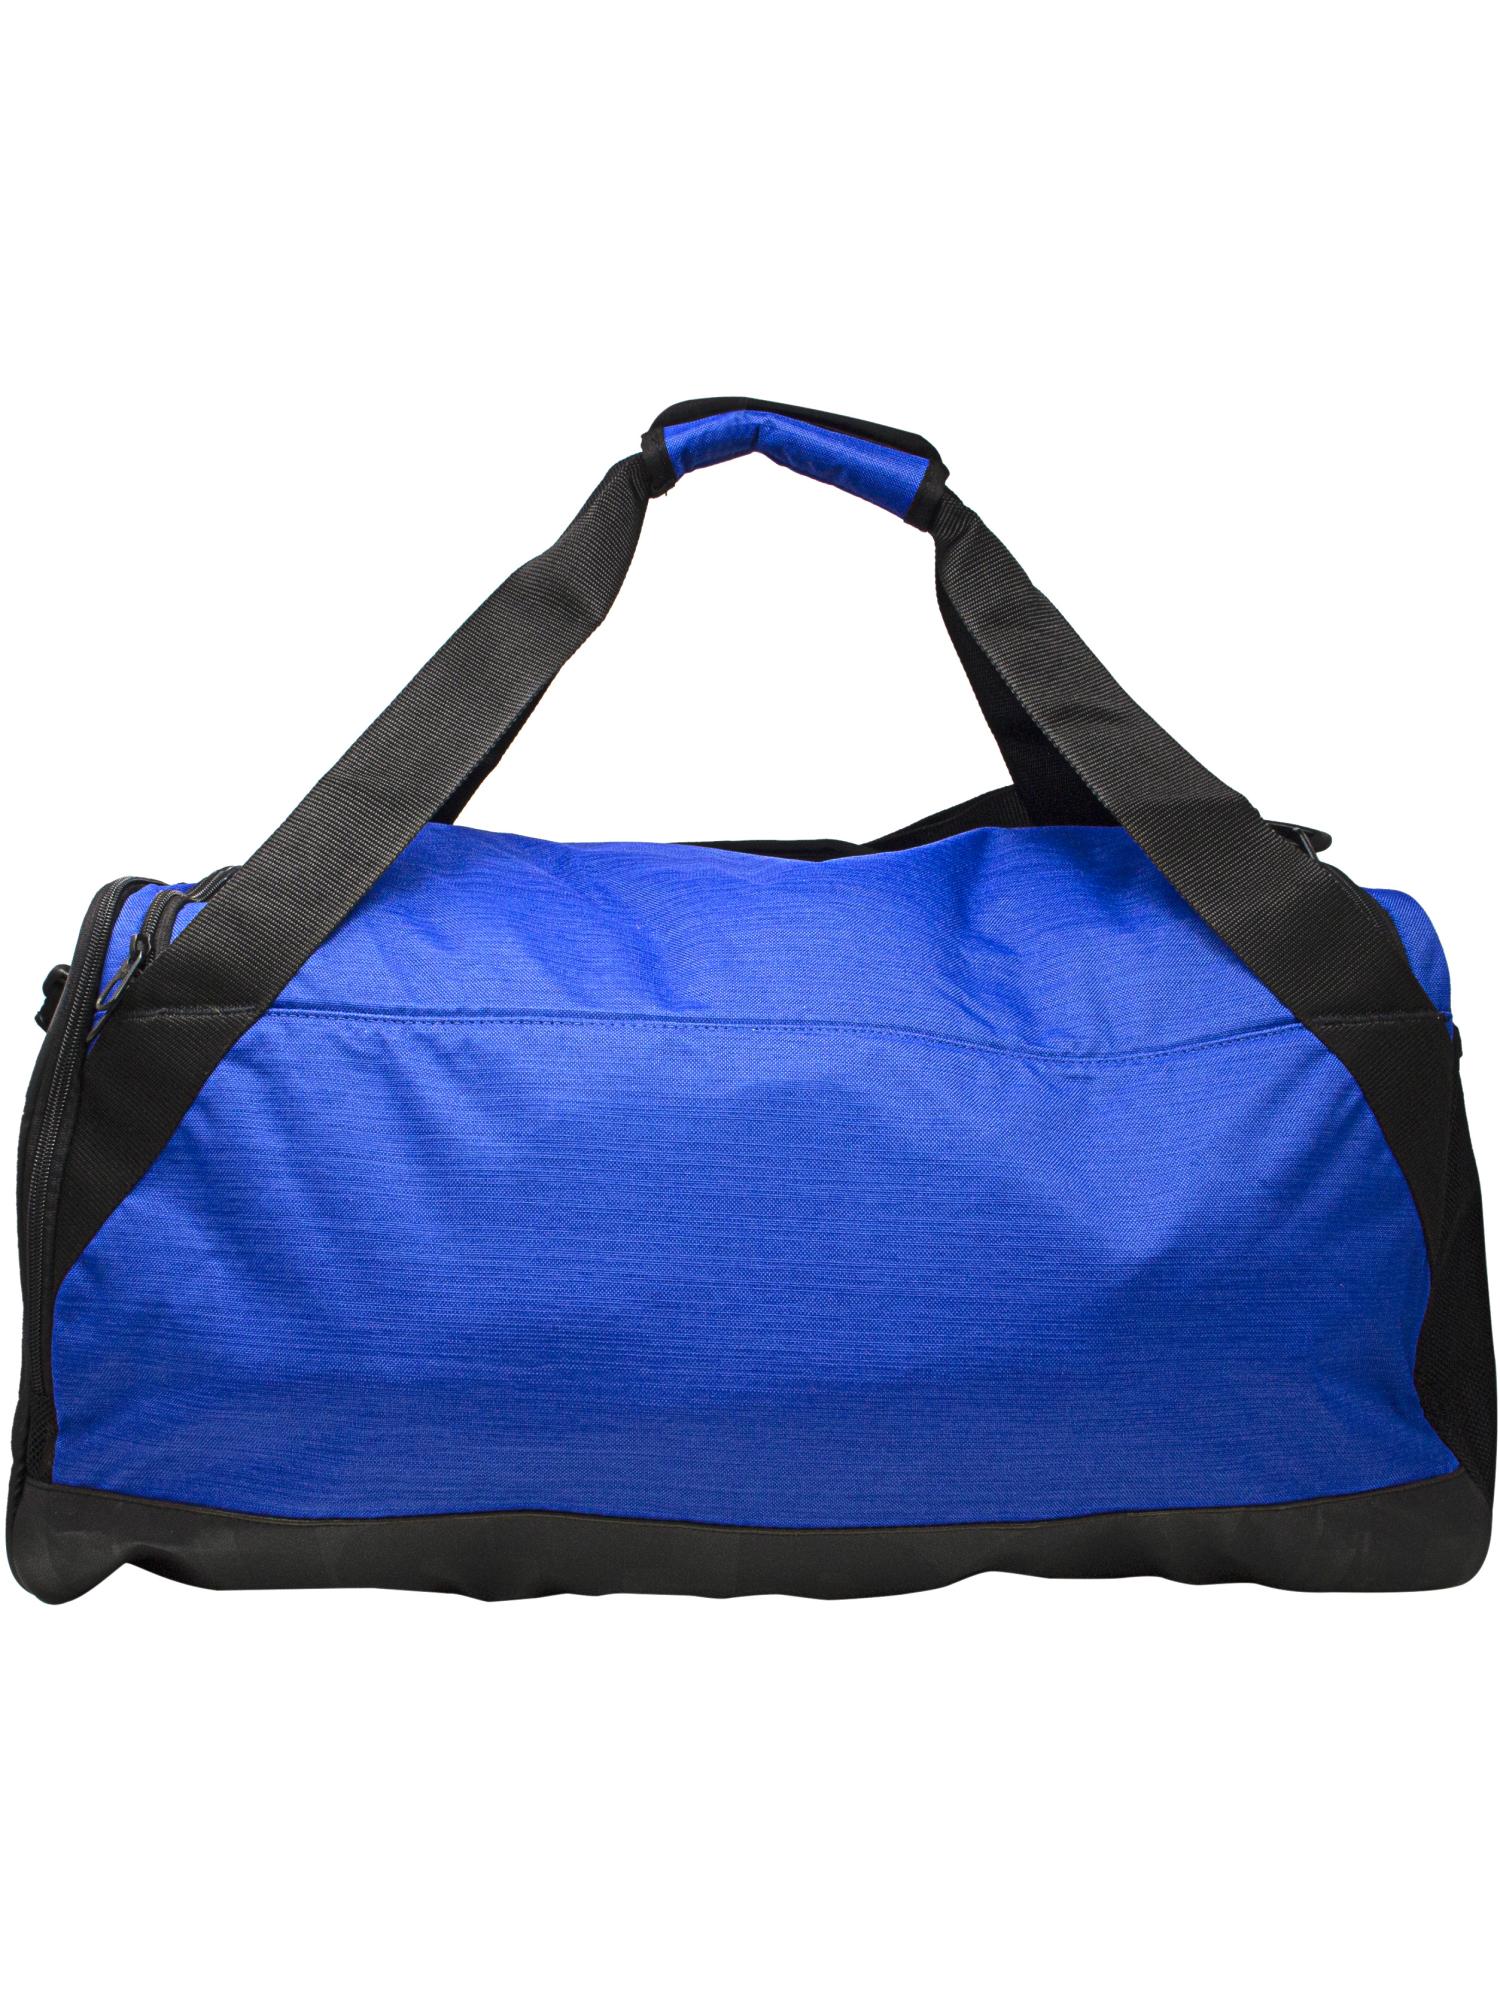 a19cf29e2380 Nike Brasilia Duffel Polyester Duffle Bag